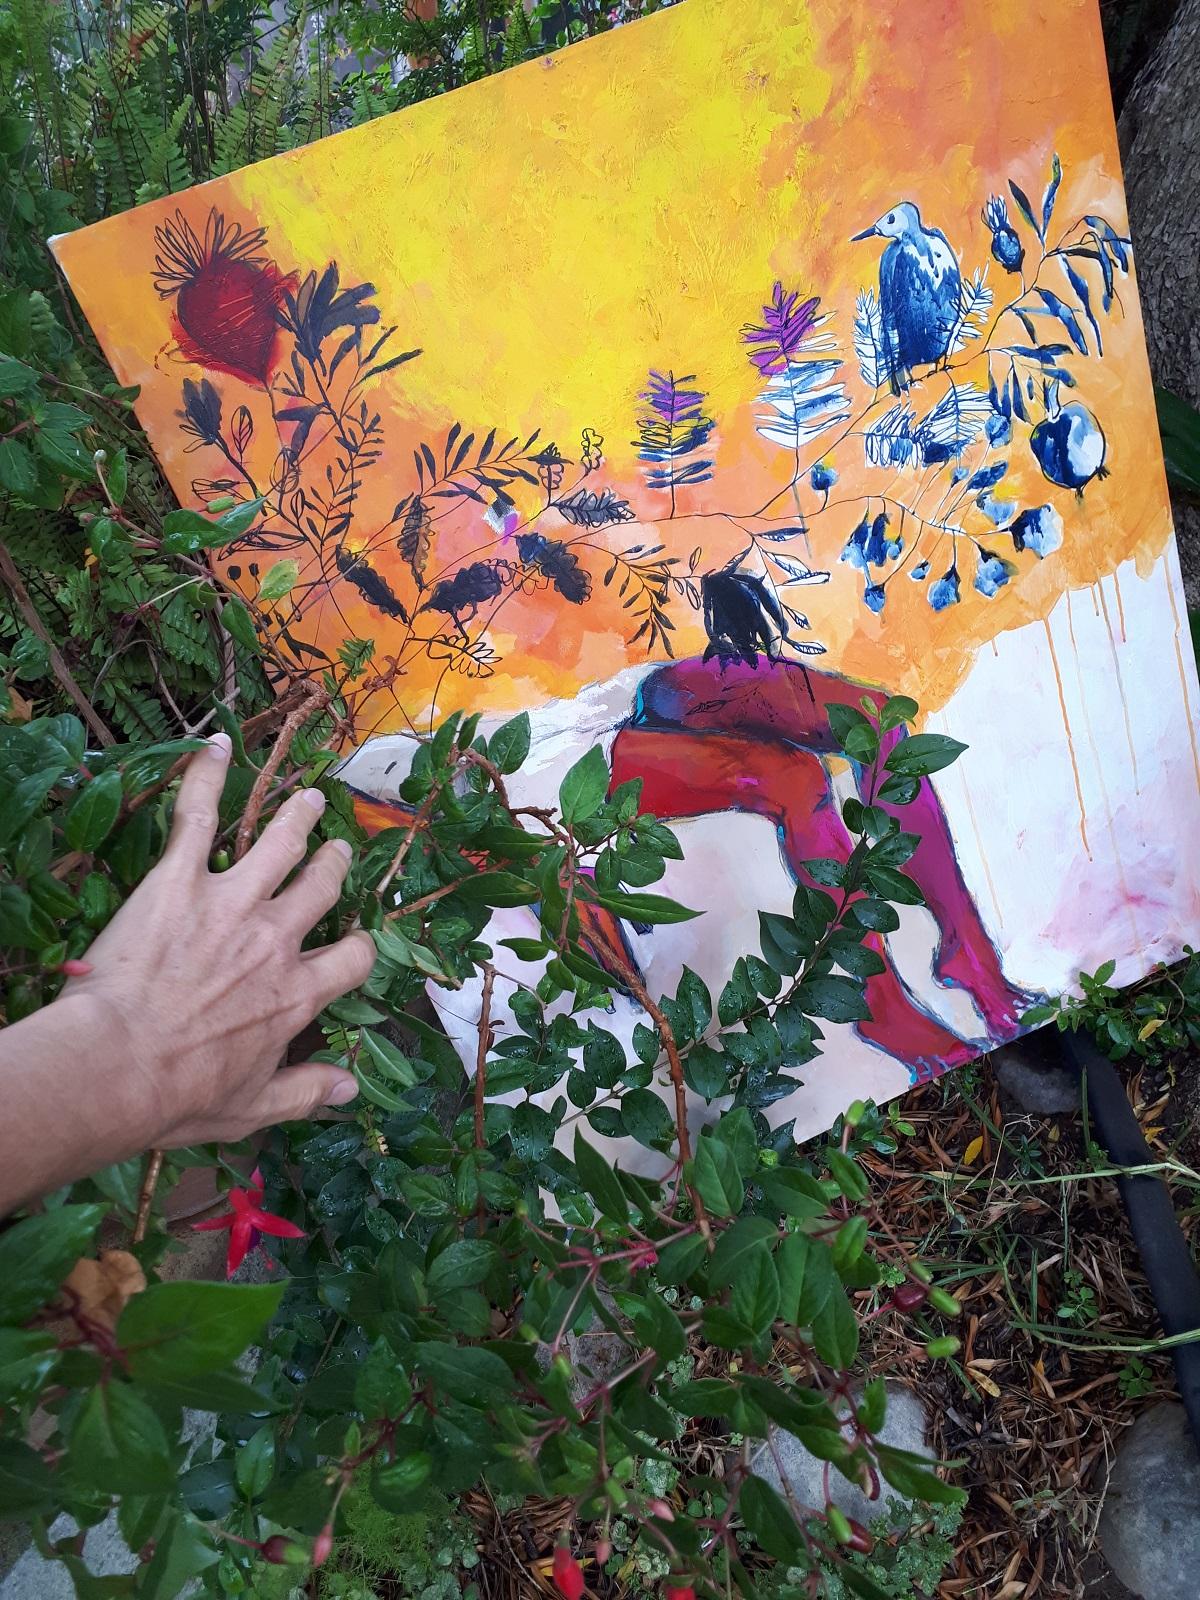 Symbolic painting by Glendine